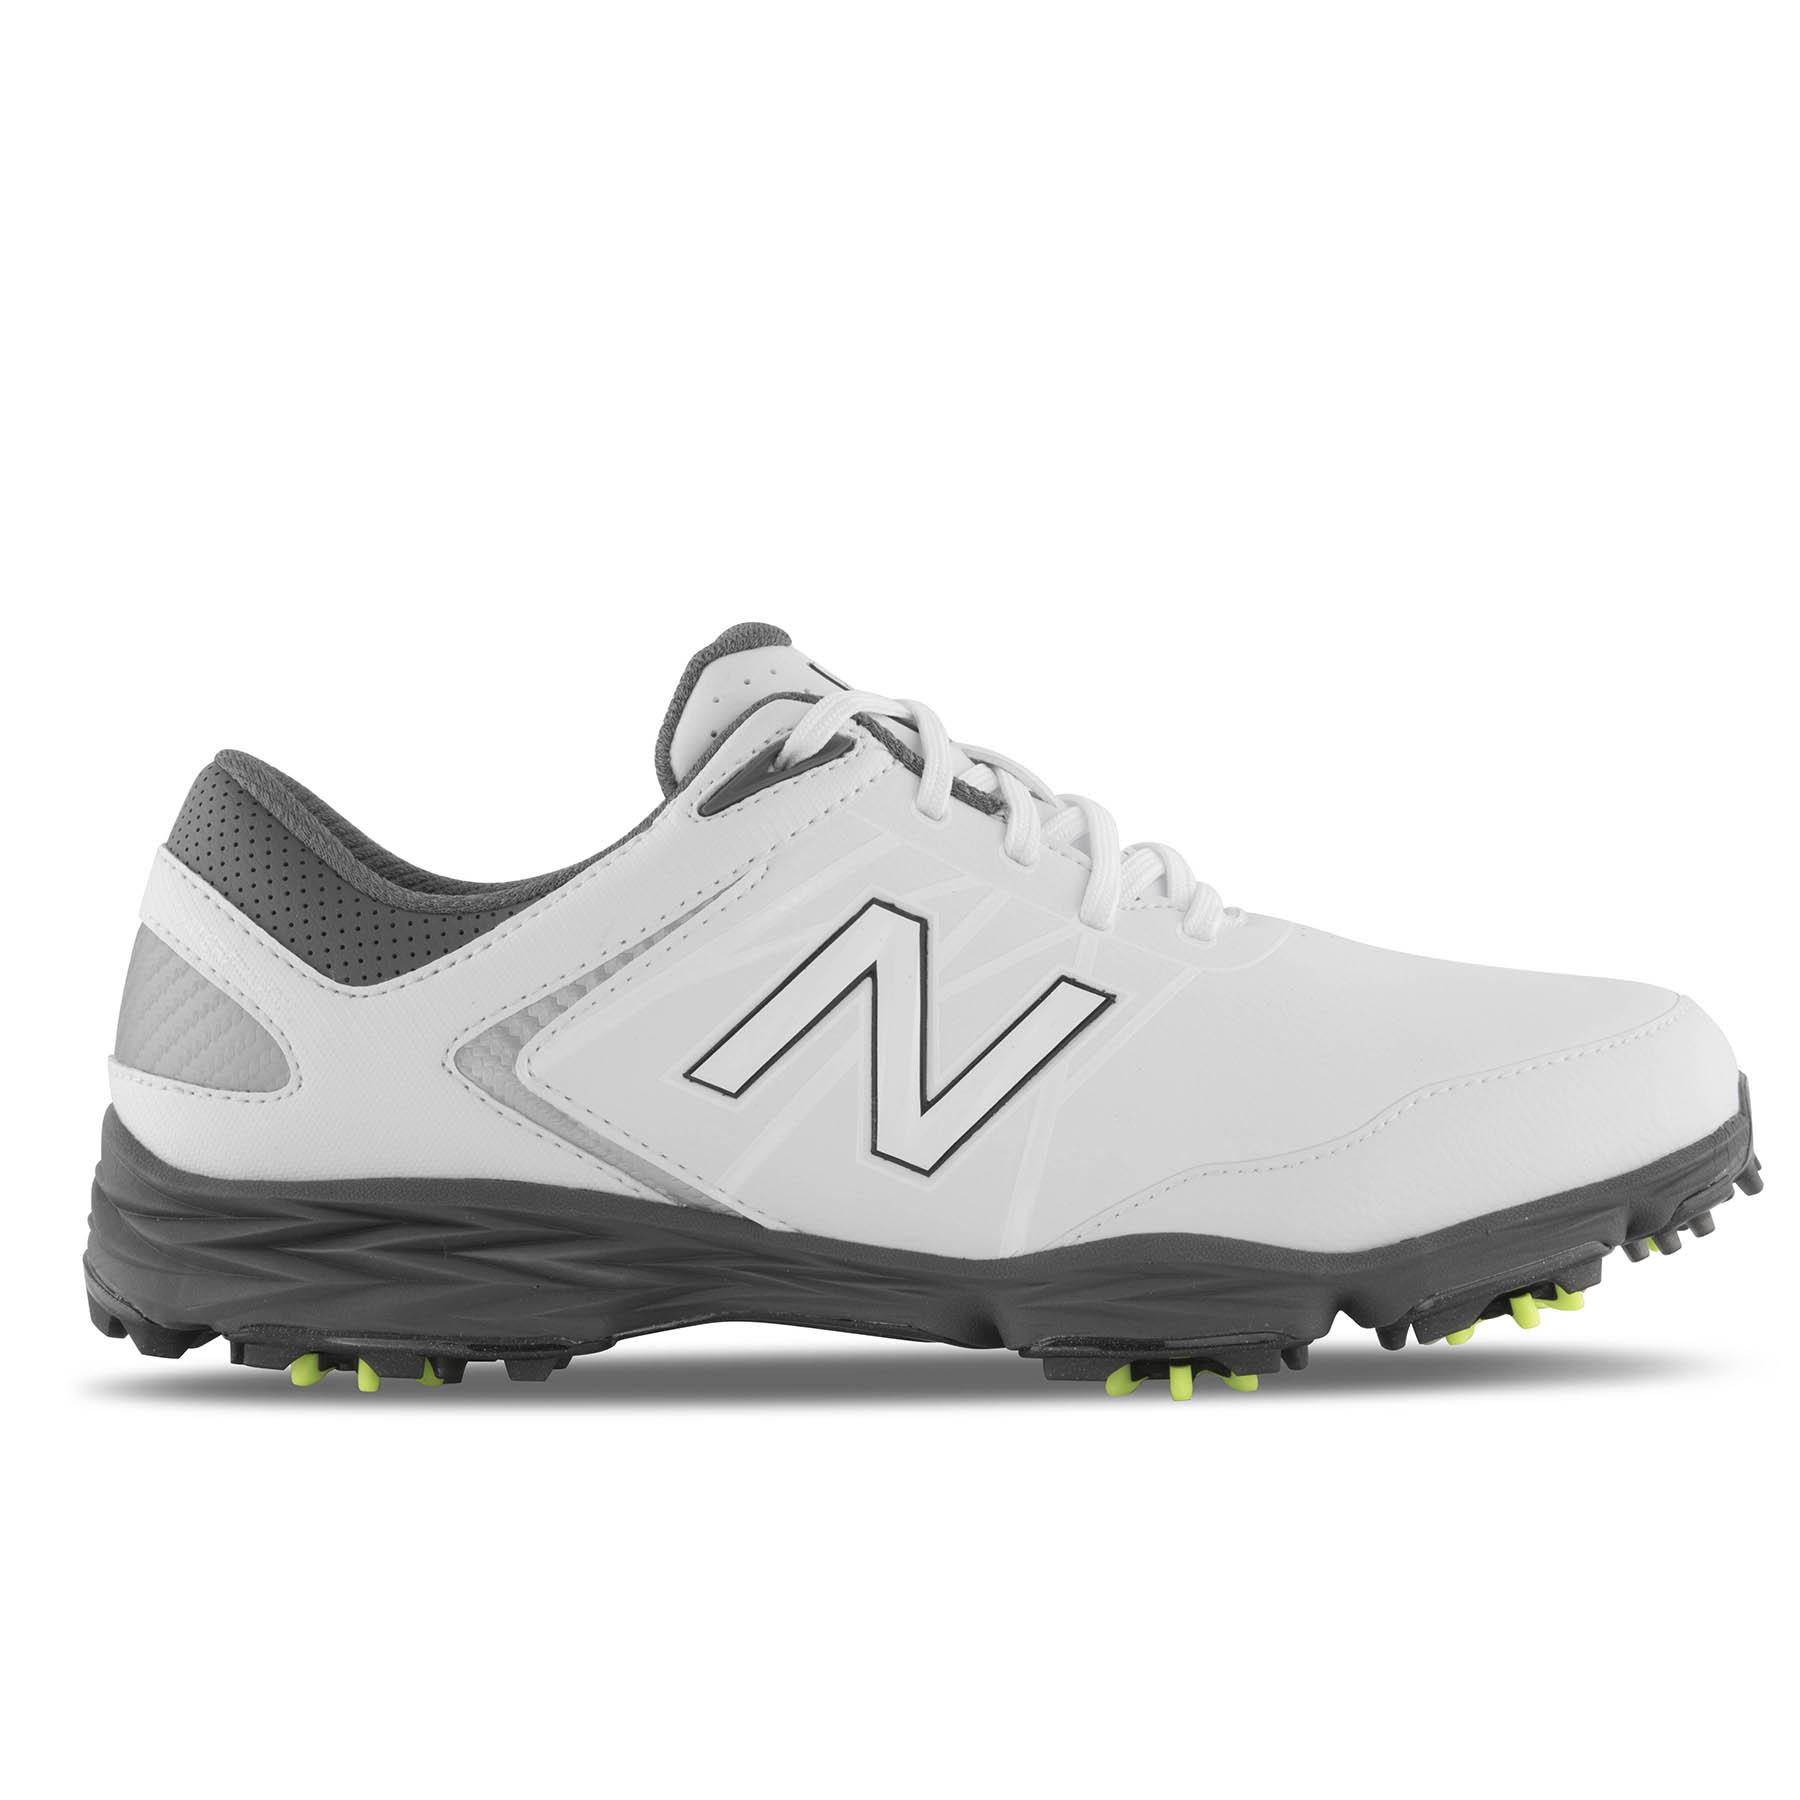 NB Striker Men's Golf Shoe - White/Grey